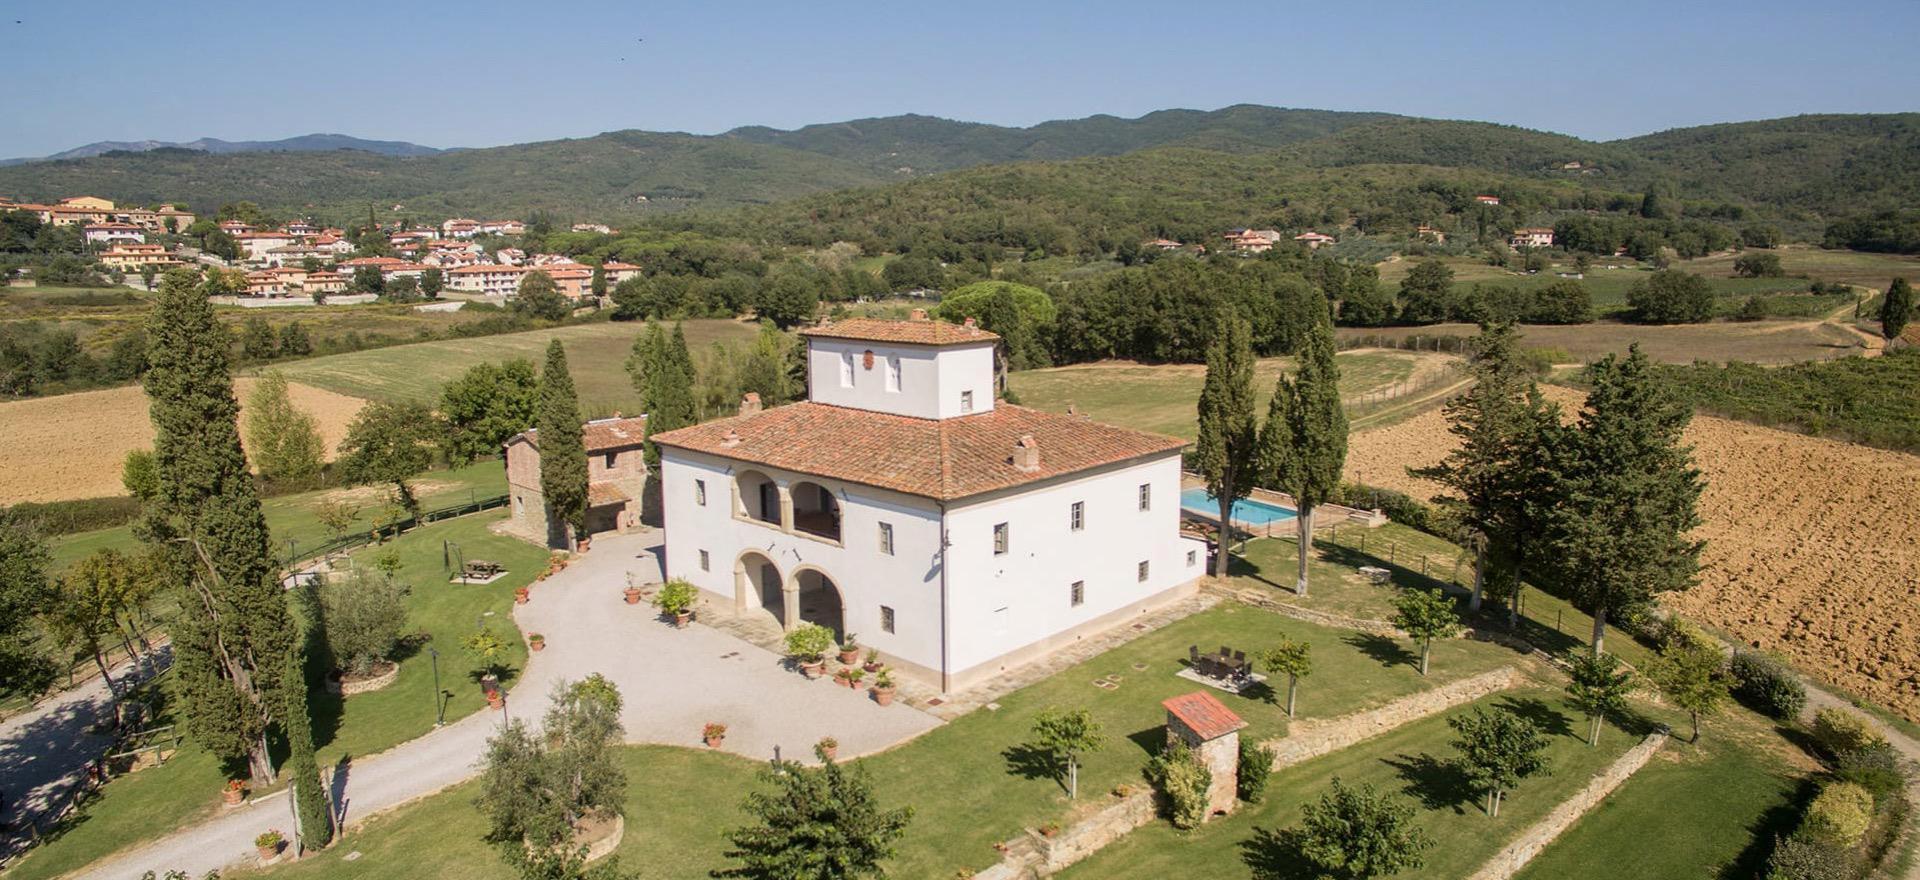 Agriturismo in Toscane op loopafstand van trattoria